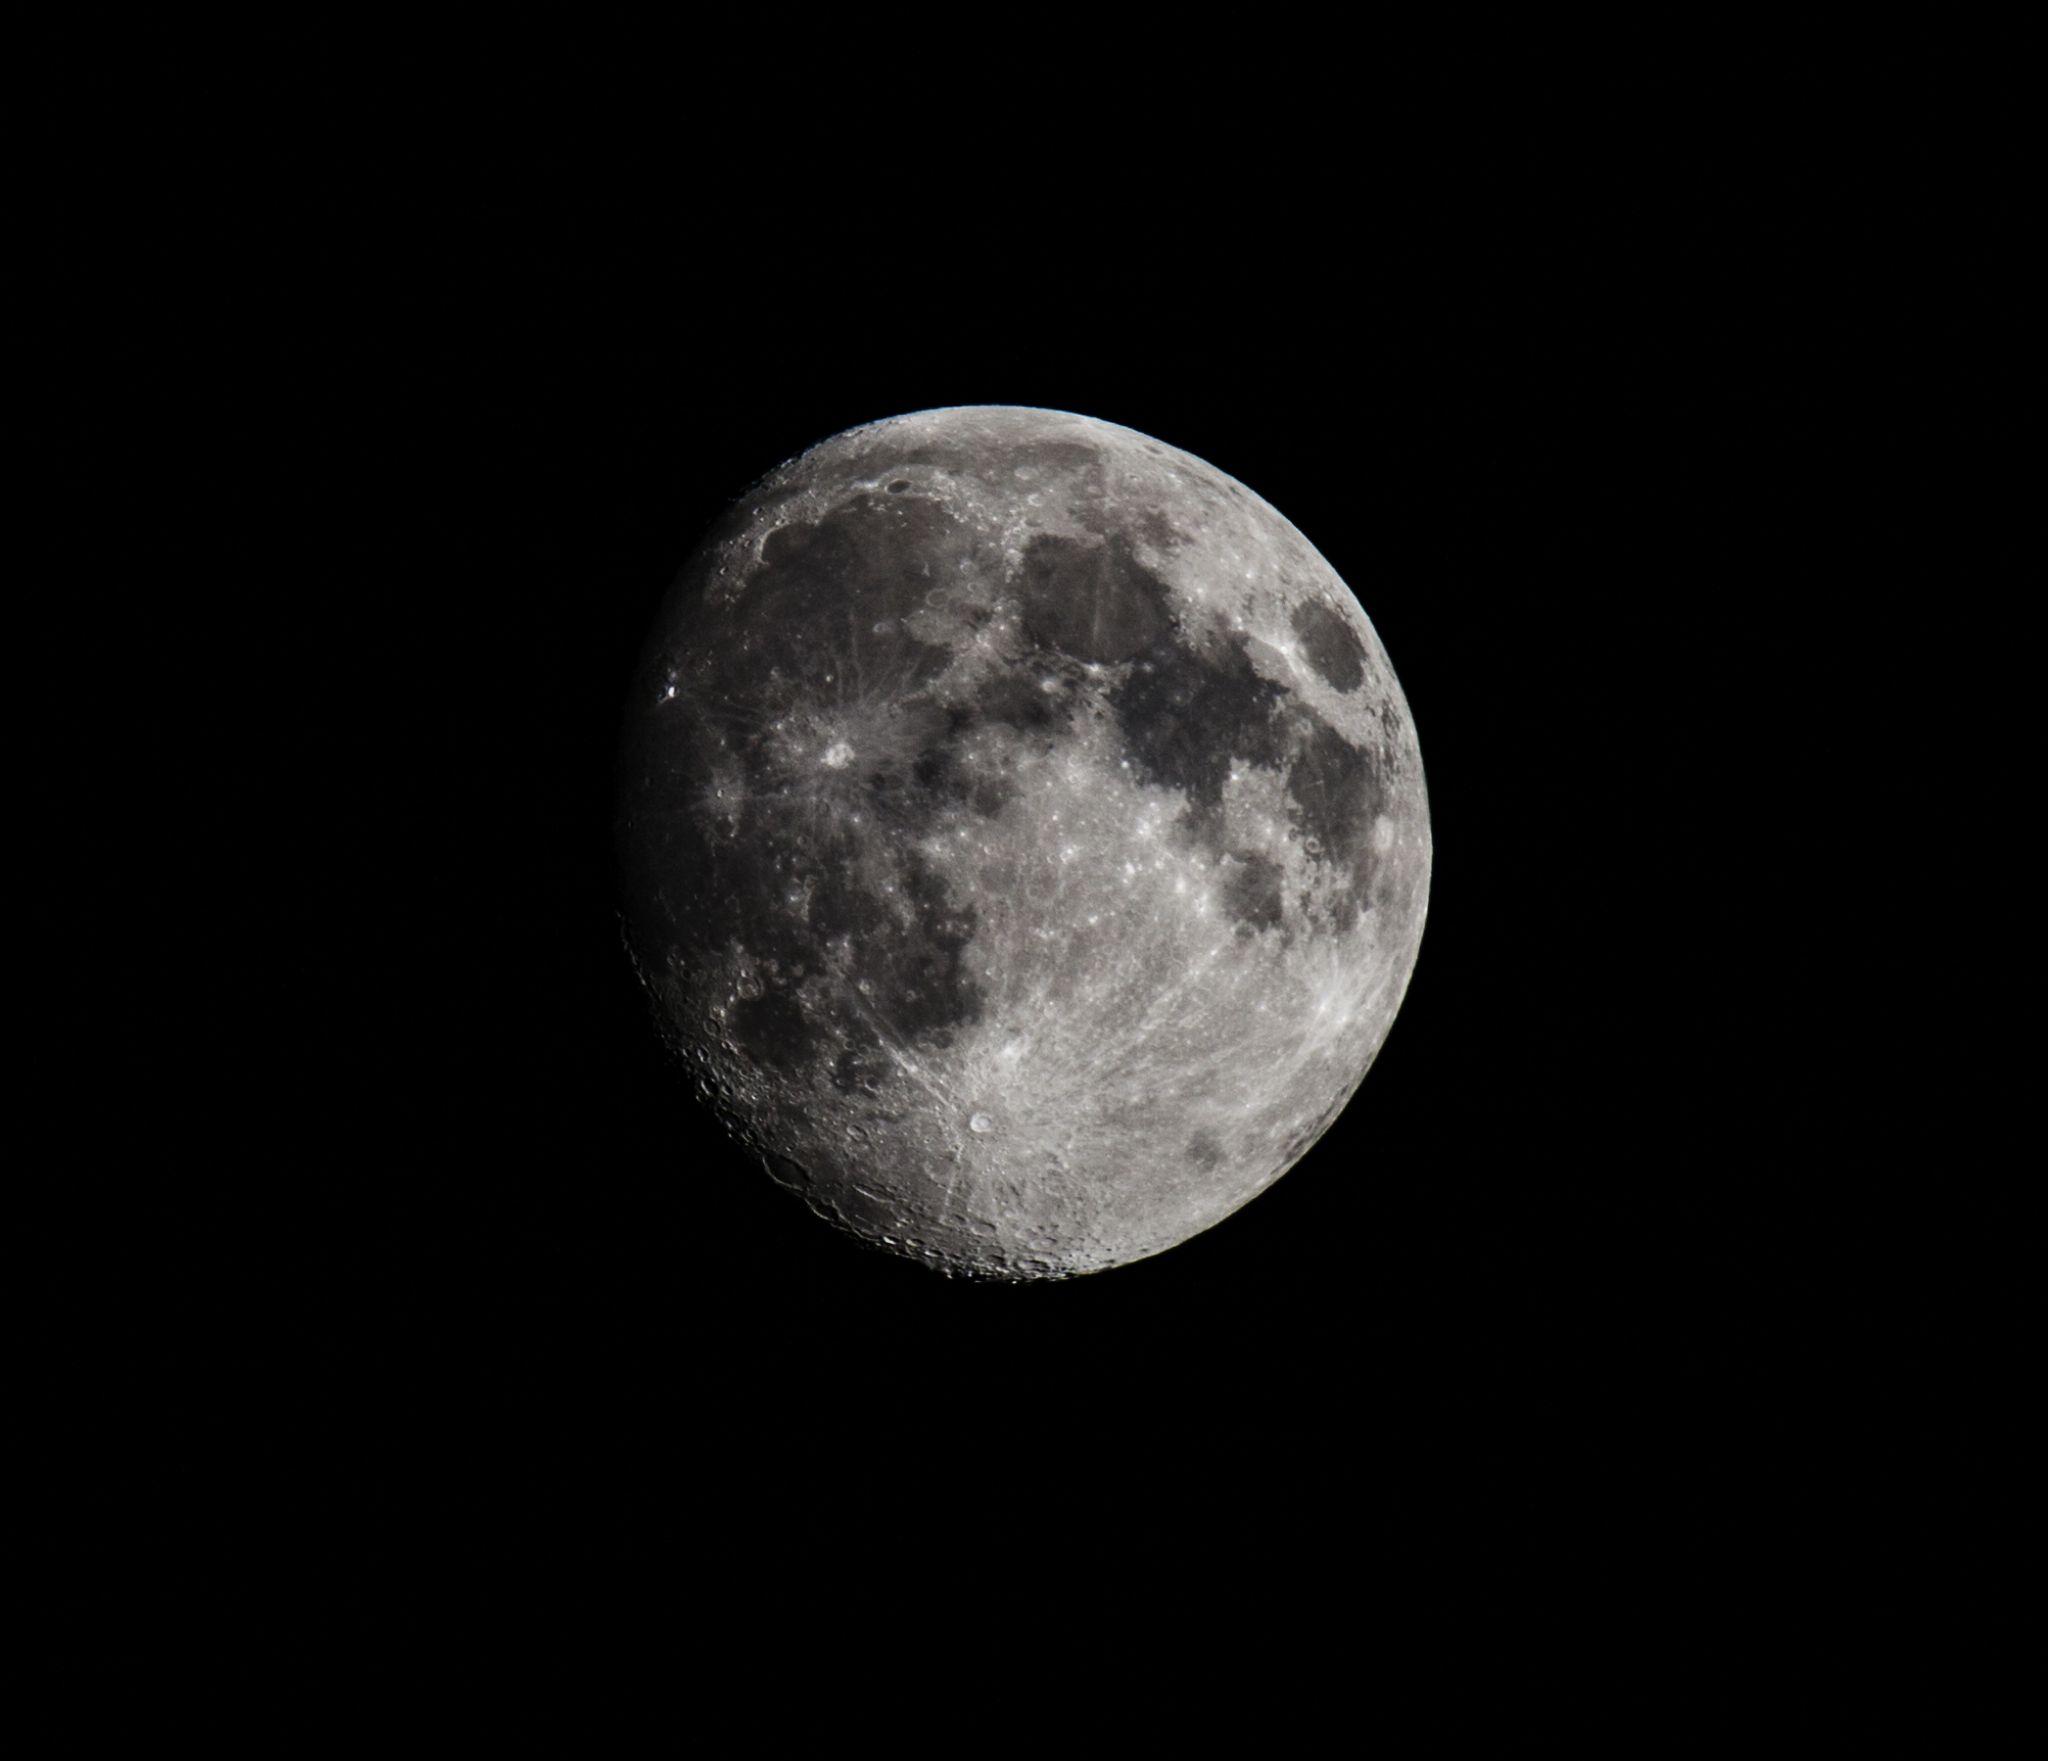 Tonights moon by Michael Clayton